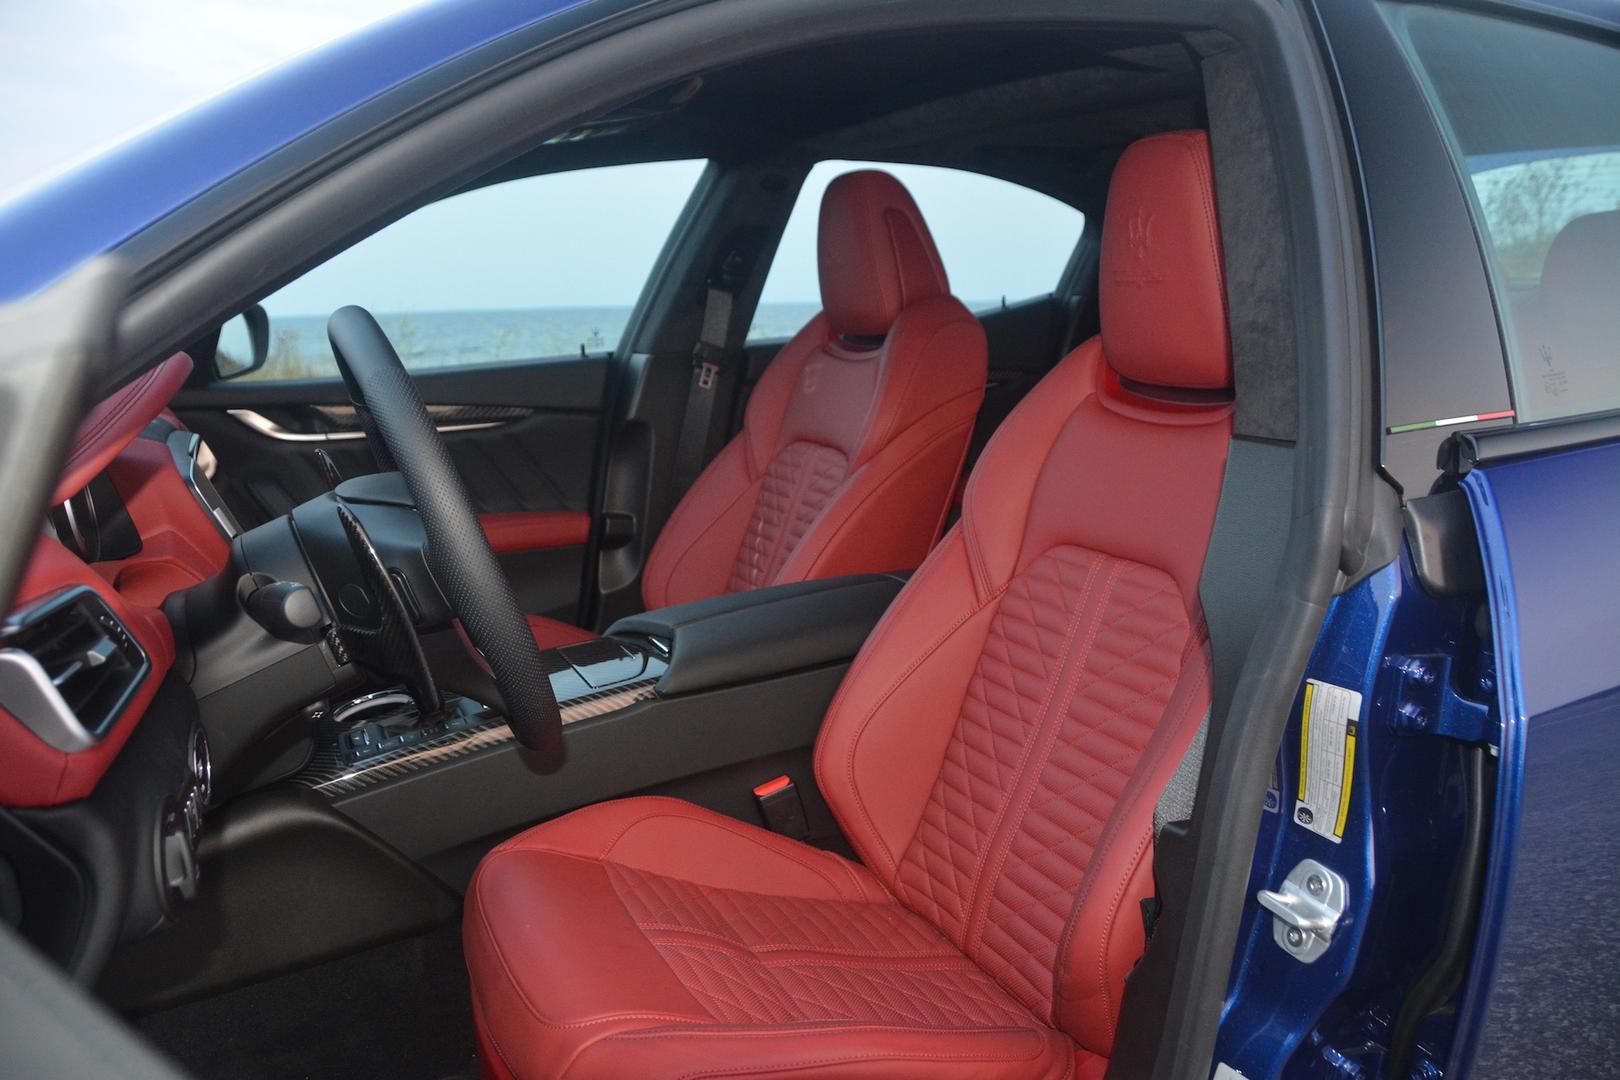 Maserati Ghibli Trofeo seats